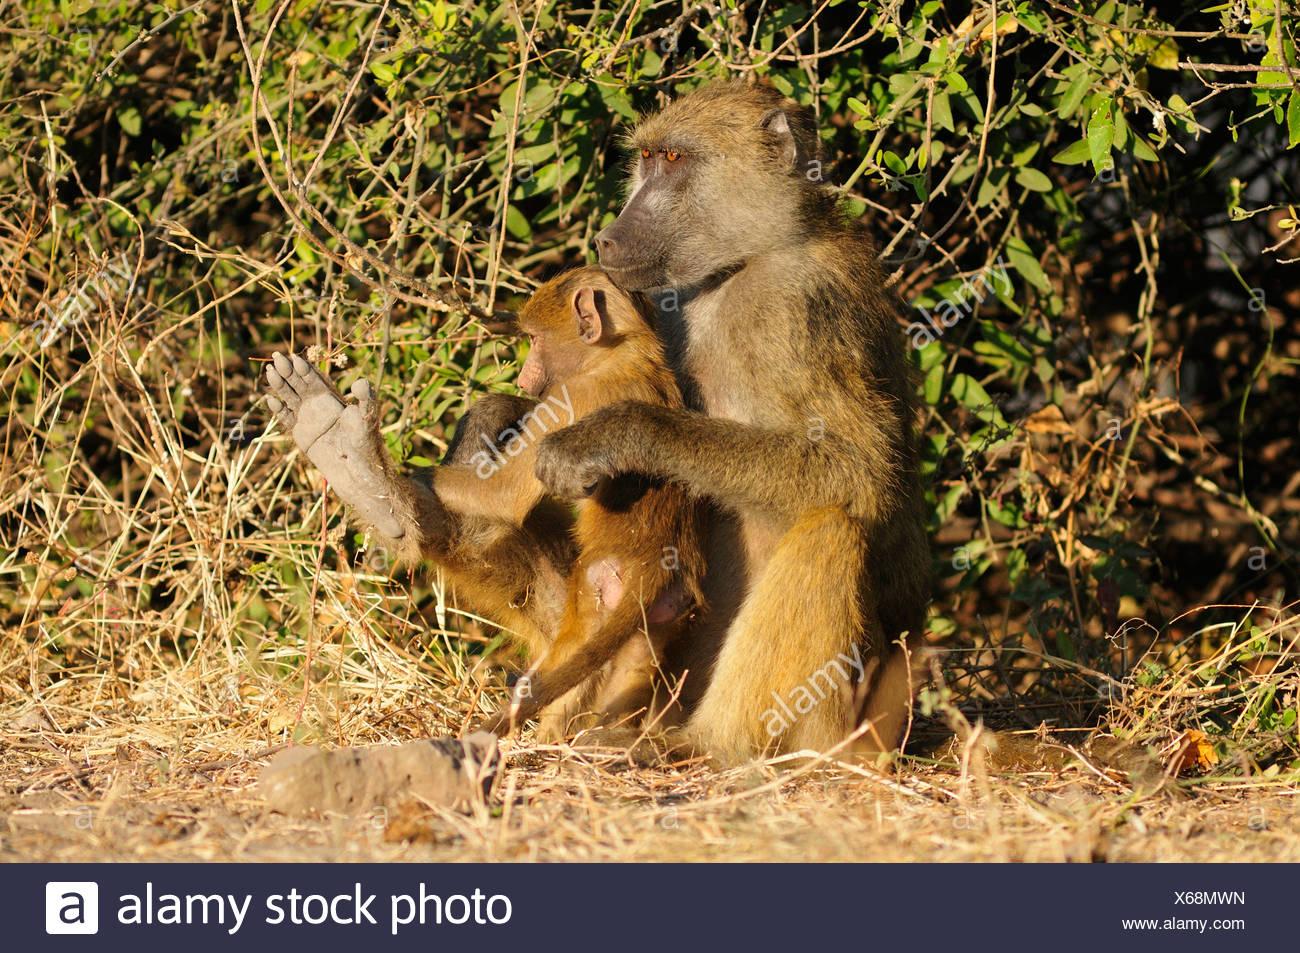 Africa, Botswana, Chobe, National Park, safari, horizontal, wildlife, baboon, mother, pup, monkey, ape, animal, - Stock Image